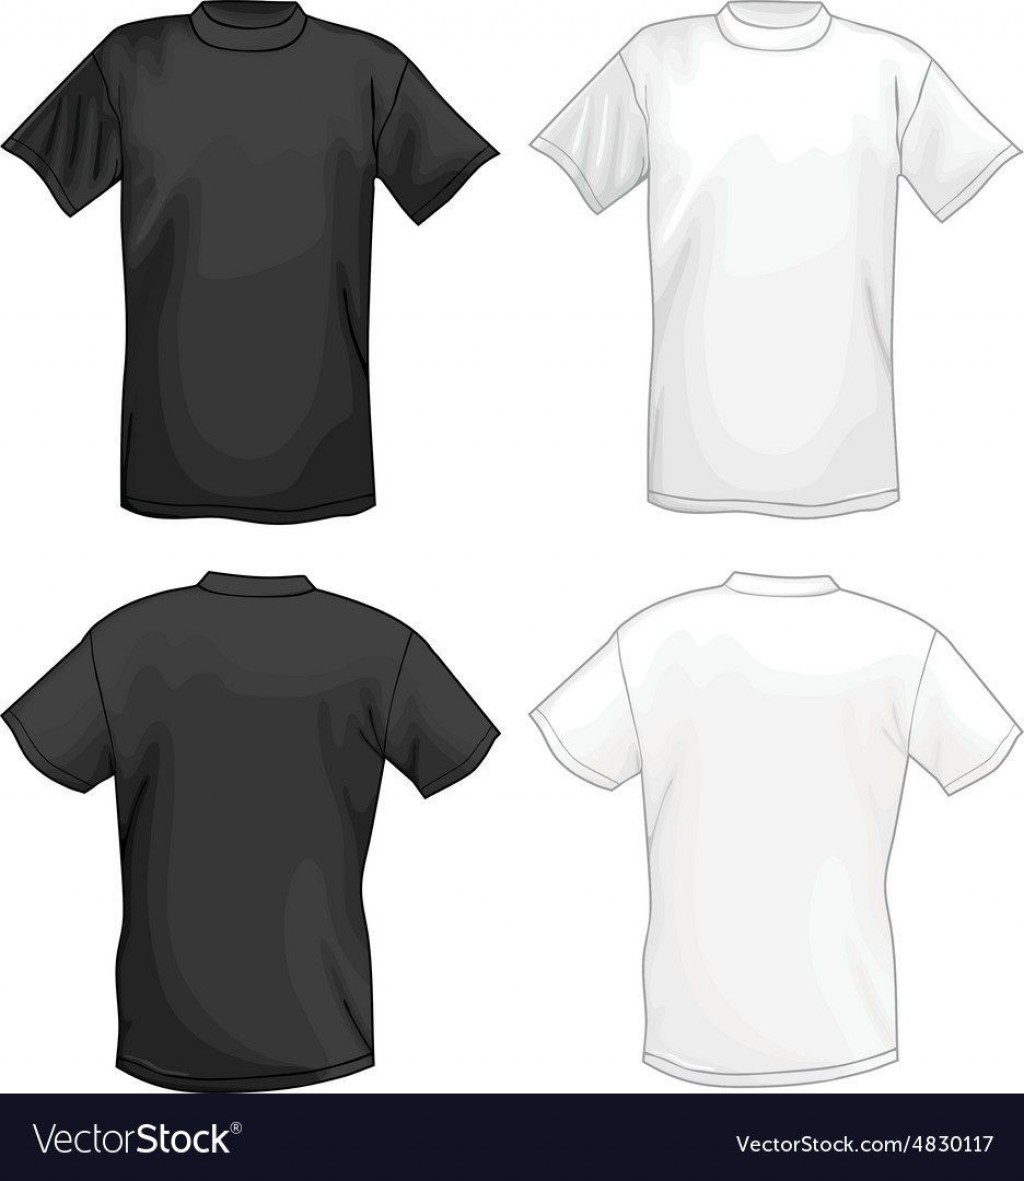 002 Phenomenal T Shirt Template Design High Def  Psd Free Download EditableLarge